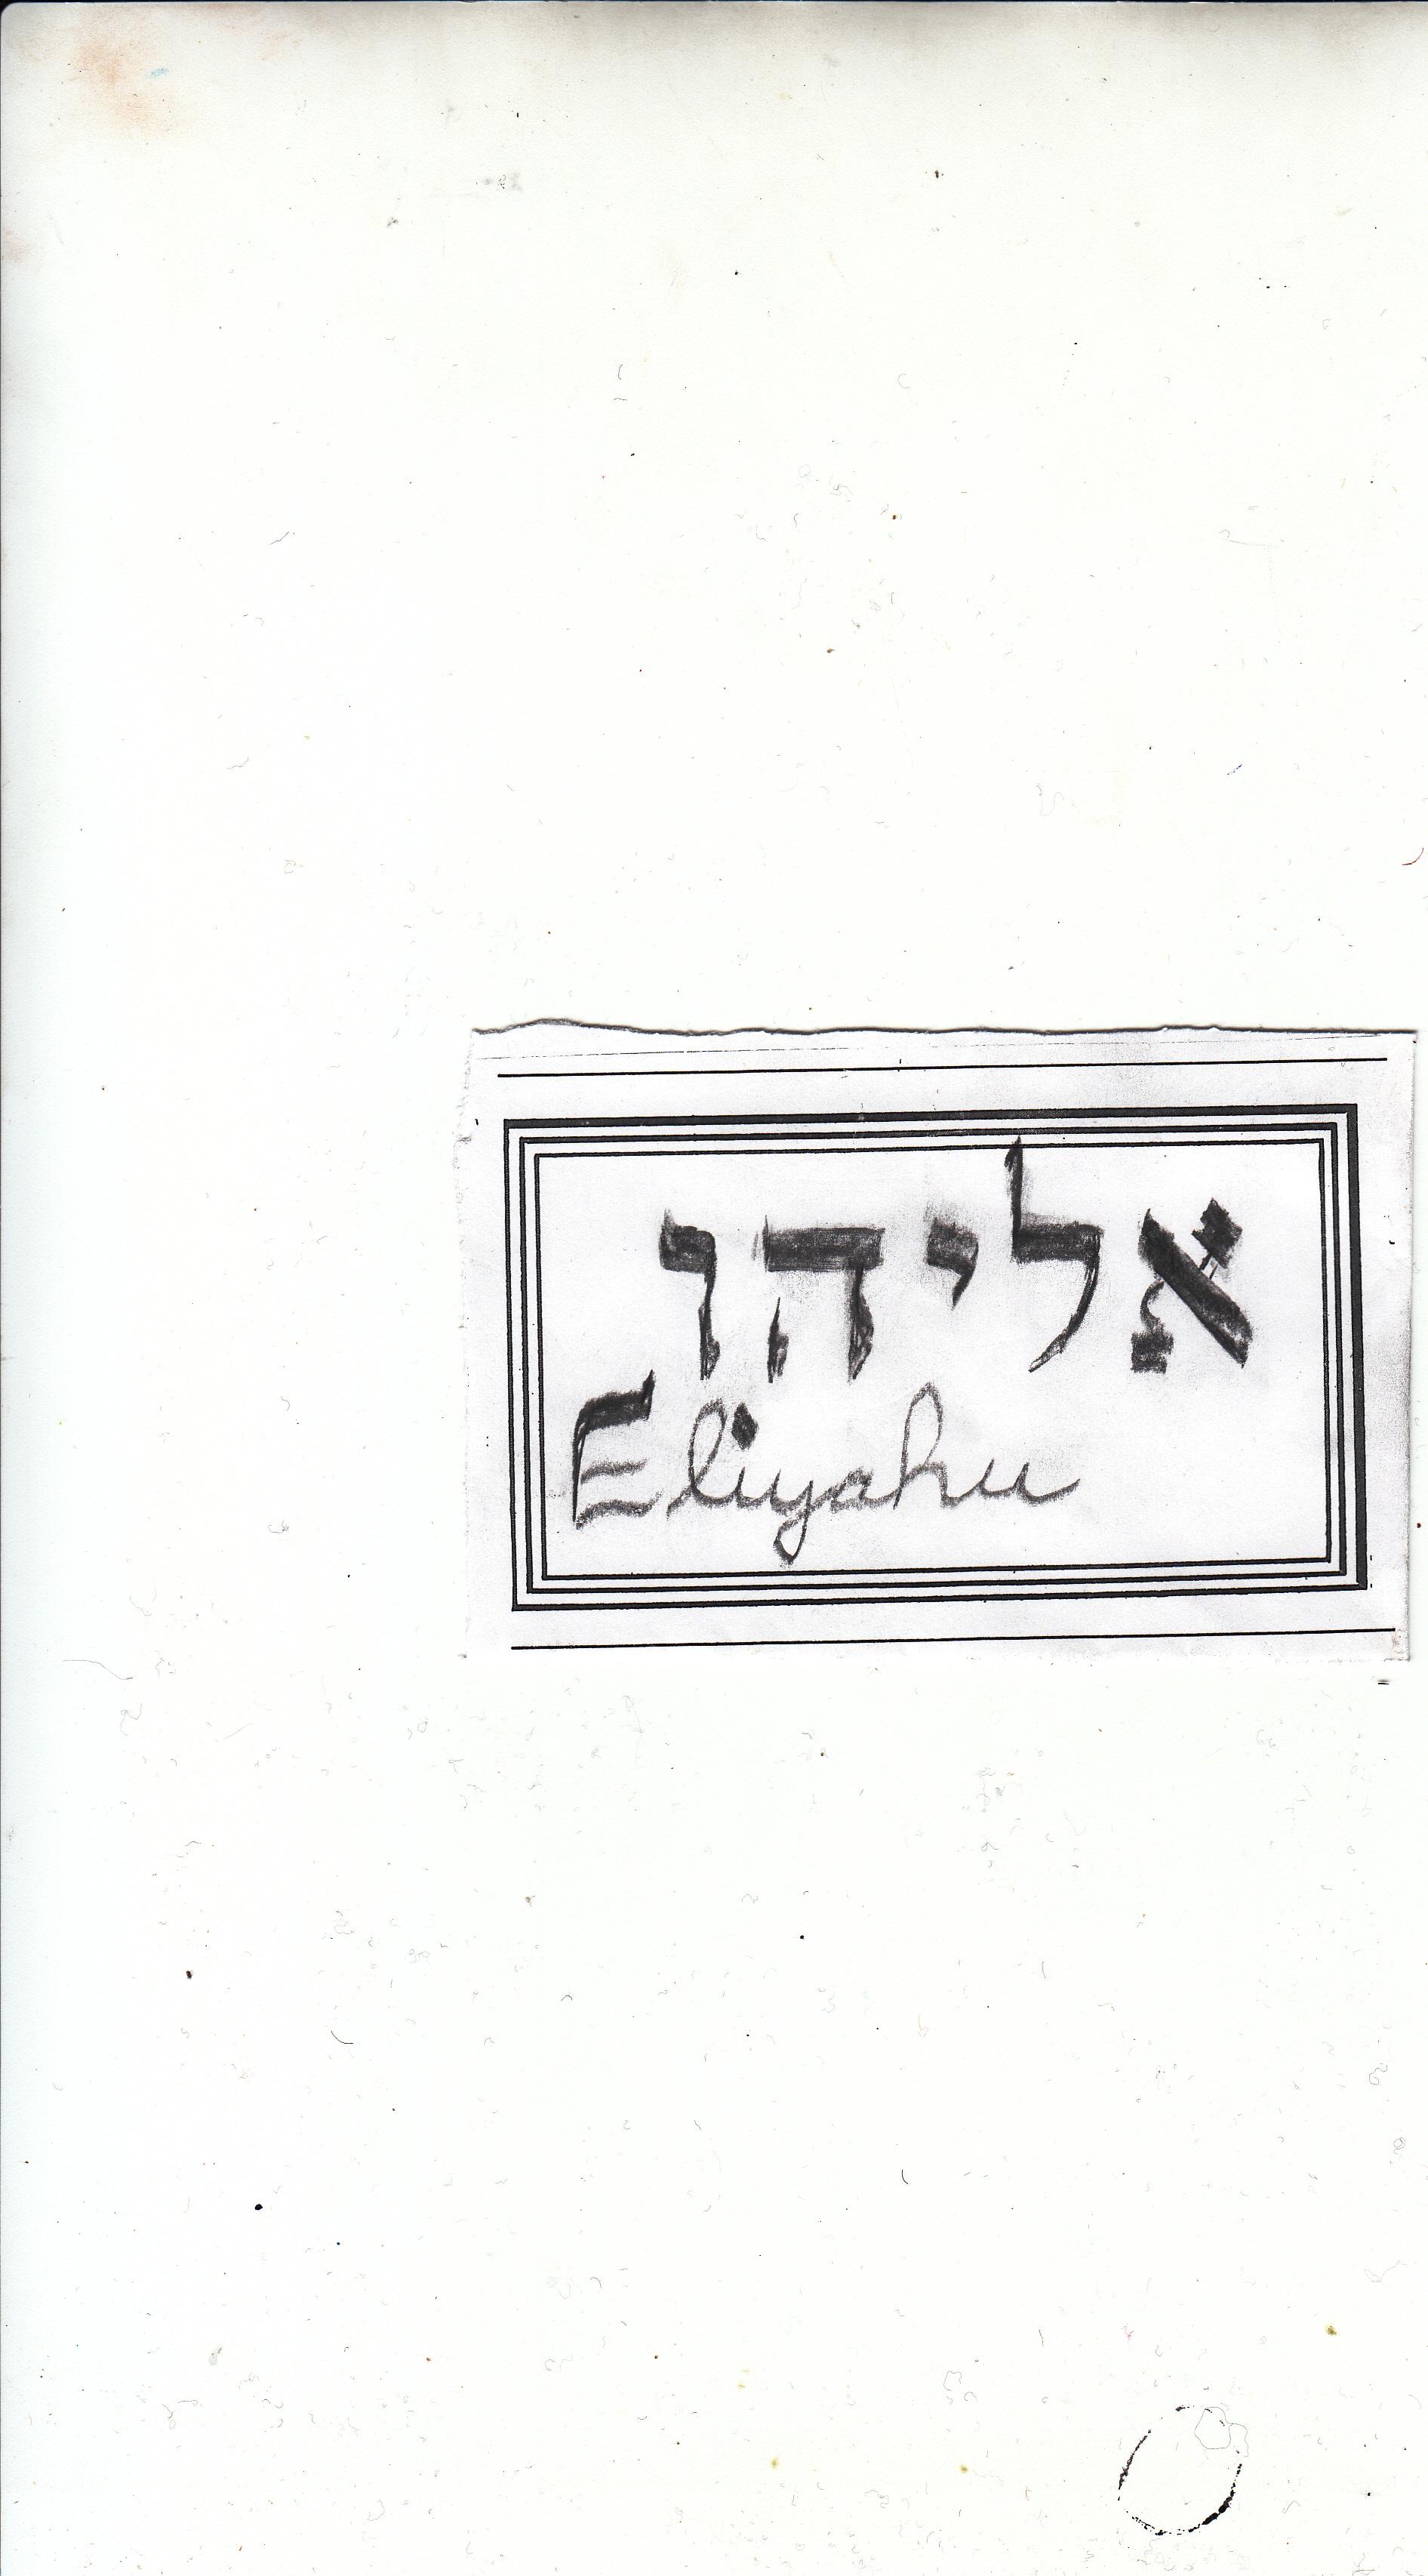 H. Ragin, Jr., a.k.a. Eliyahu  Y. O. Ben-yisra'el's Signature